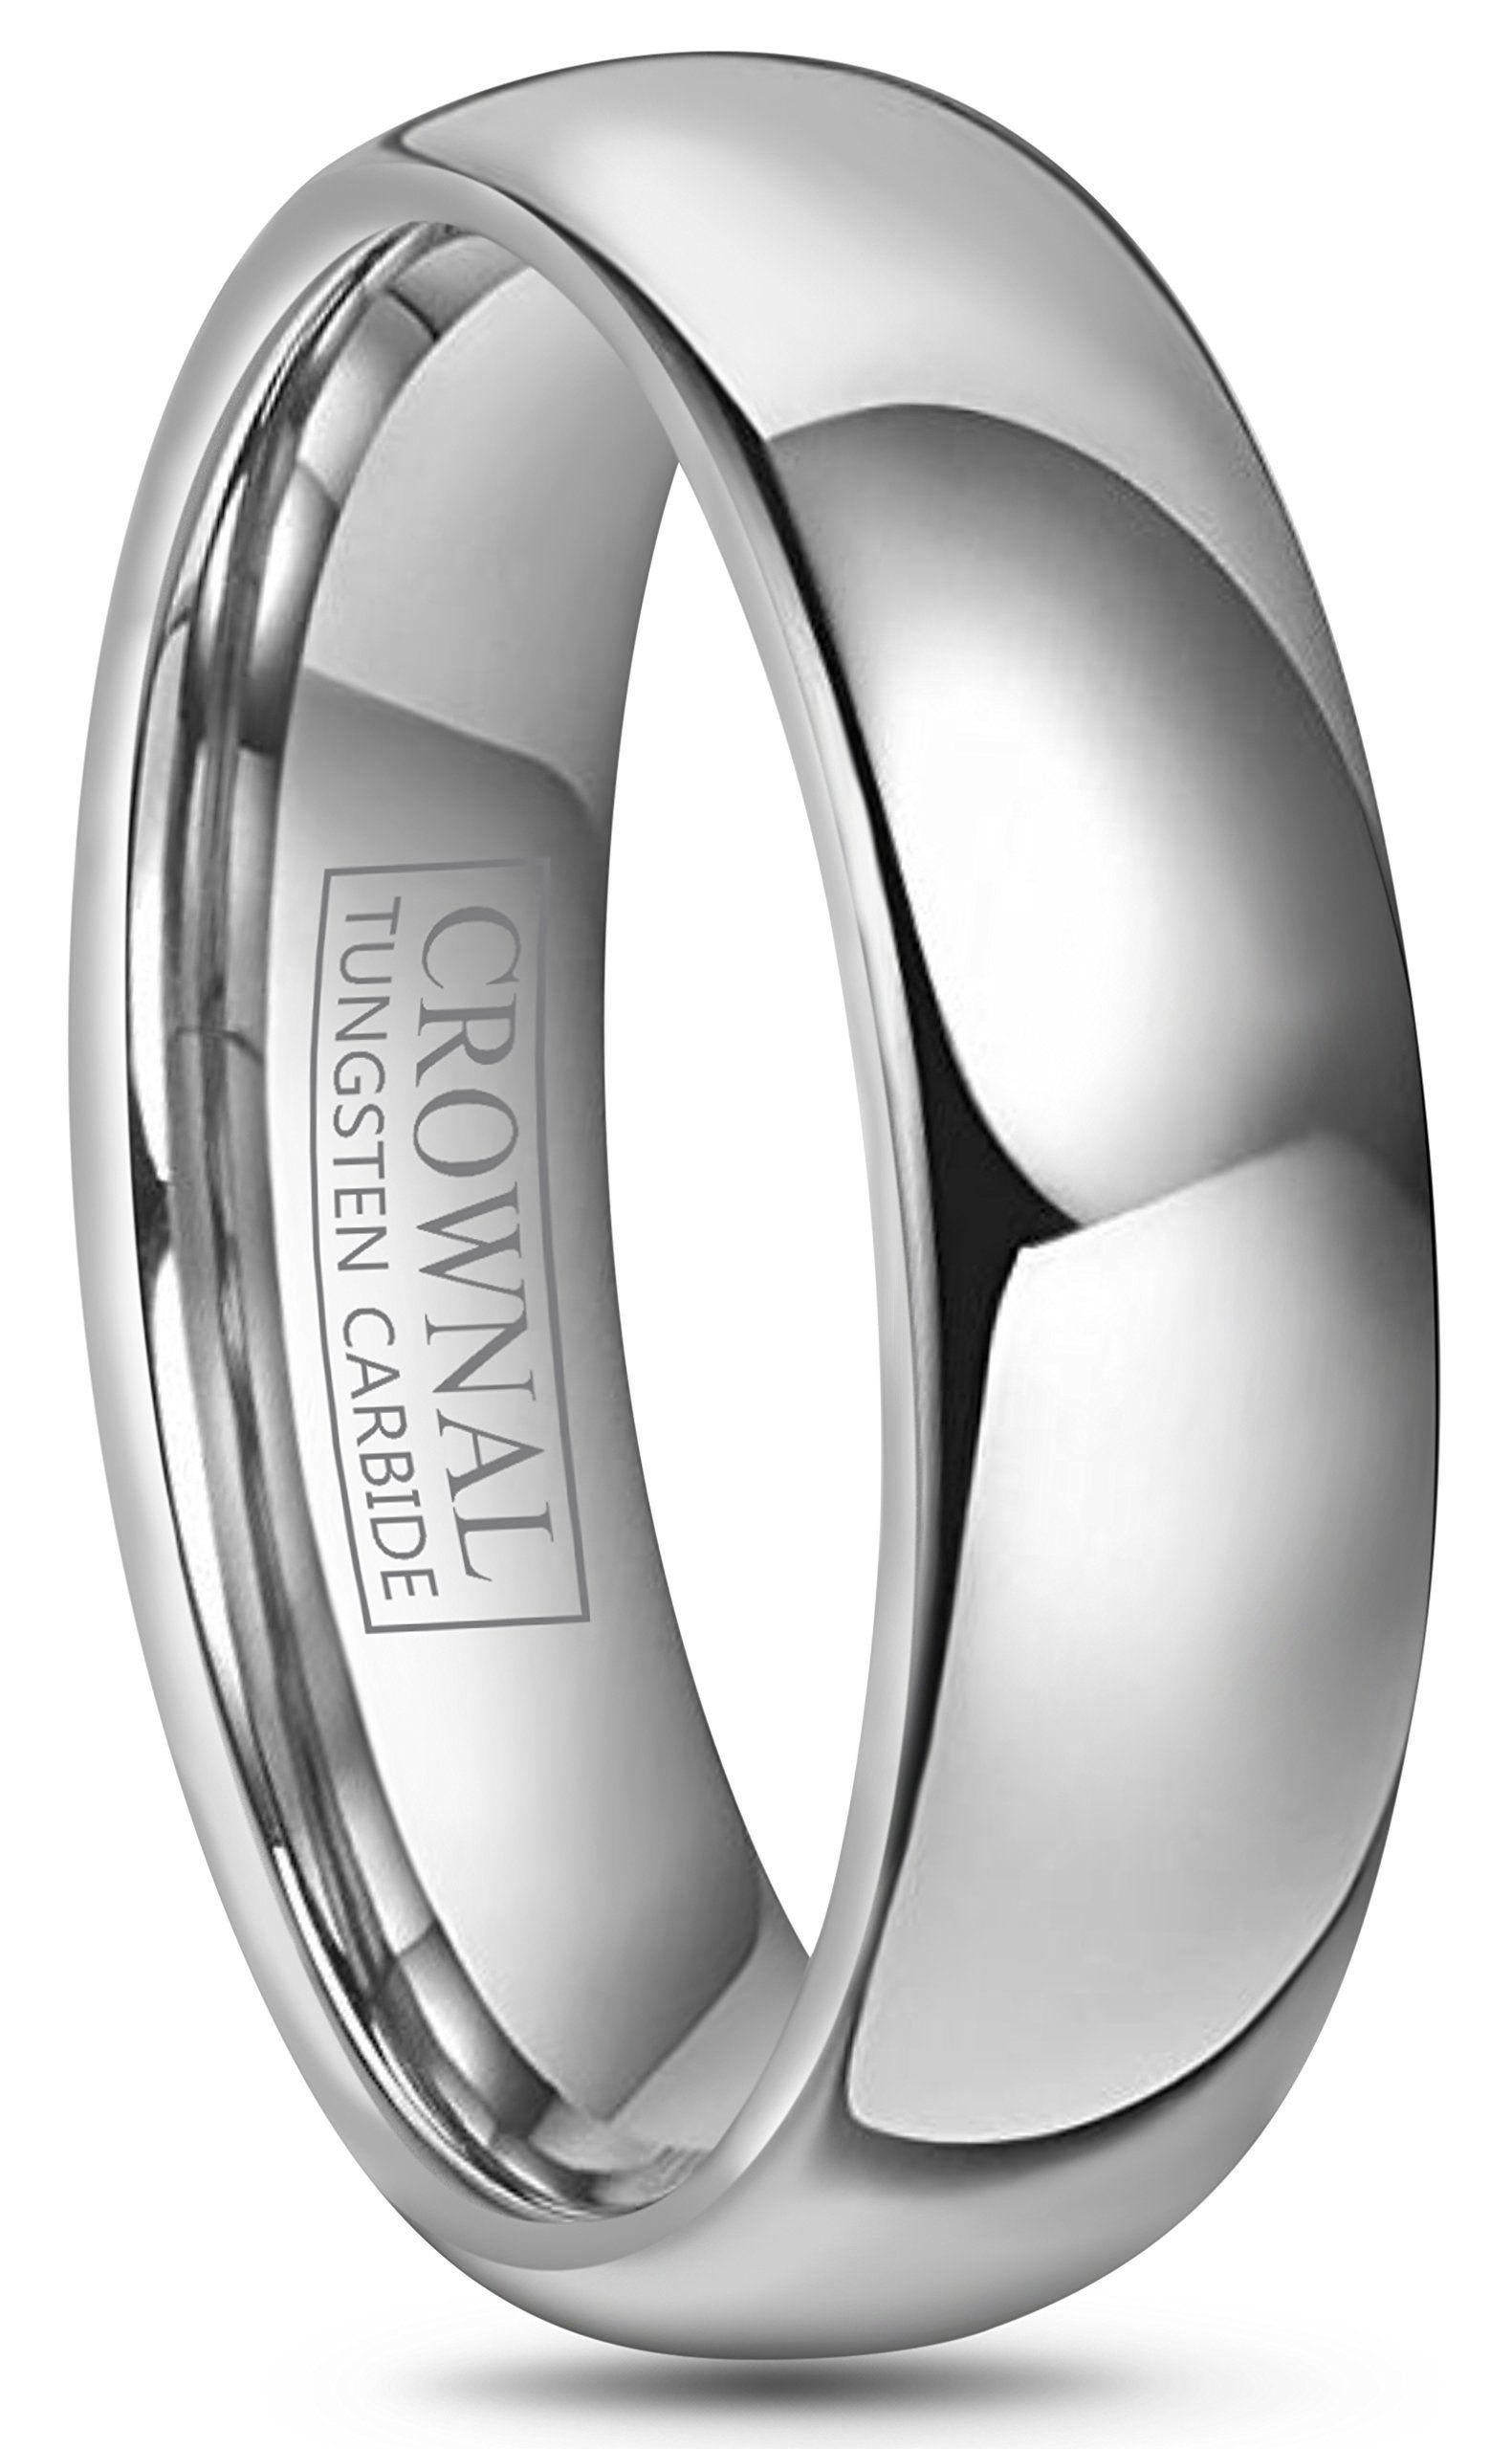 Crownal 4mm 6mm 8mm 10mm Tungsten Wedding Band Ring Men